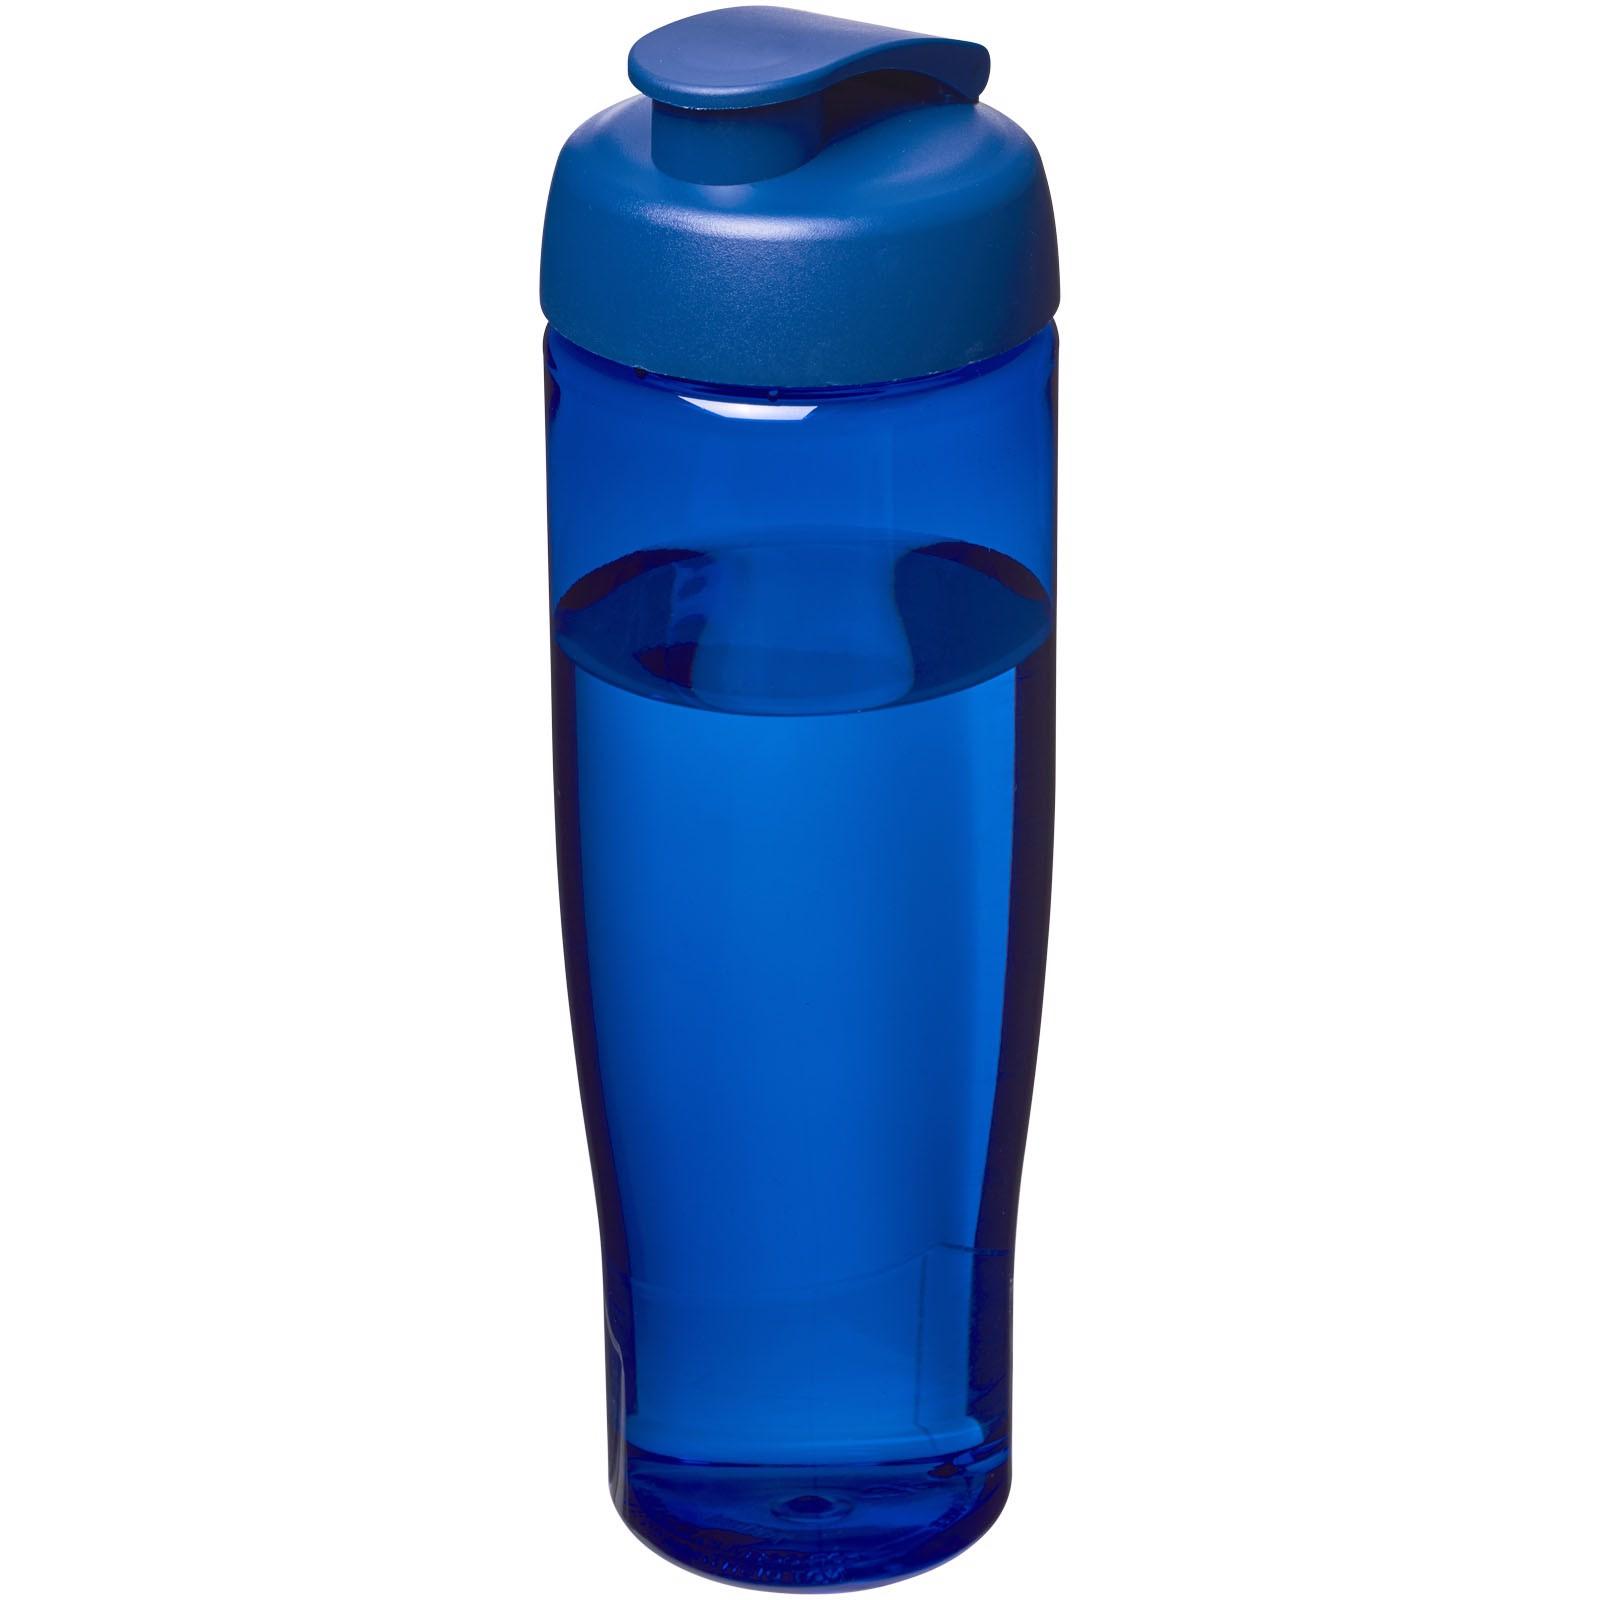 H2O Tempo® 700 ml flip lid sport bottle - Blue